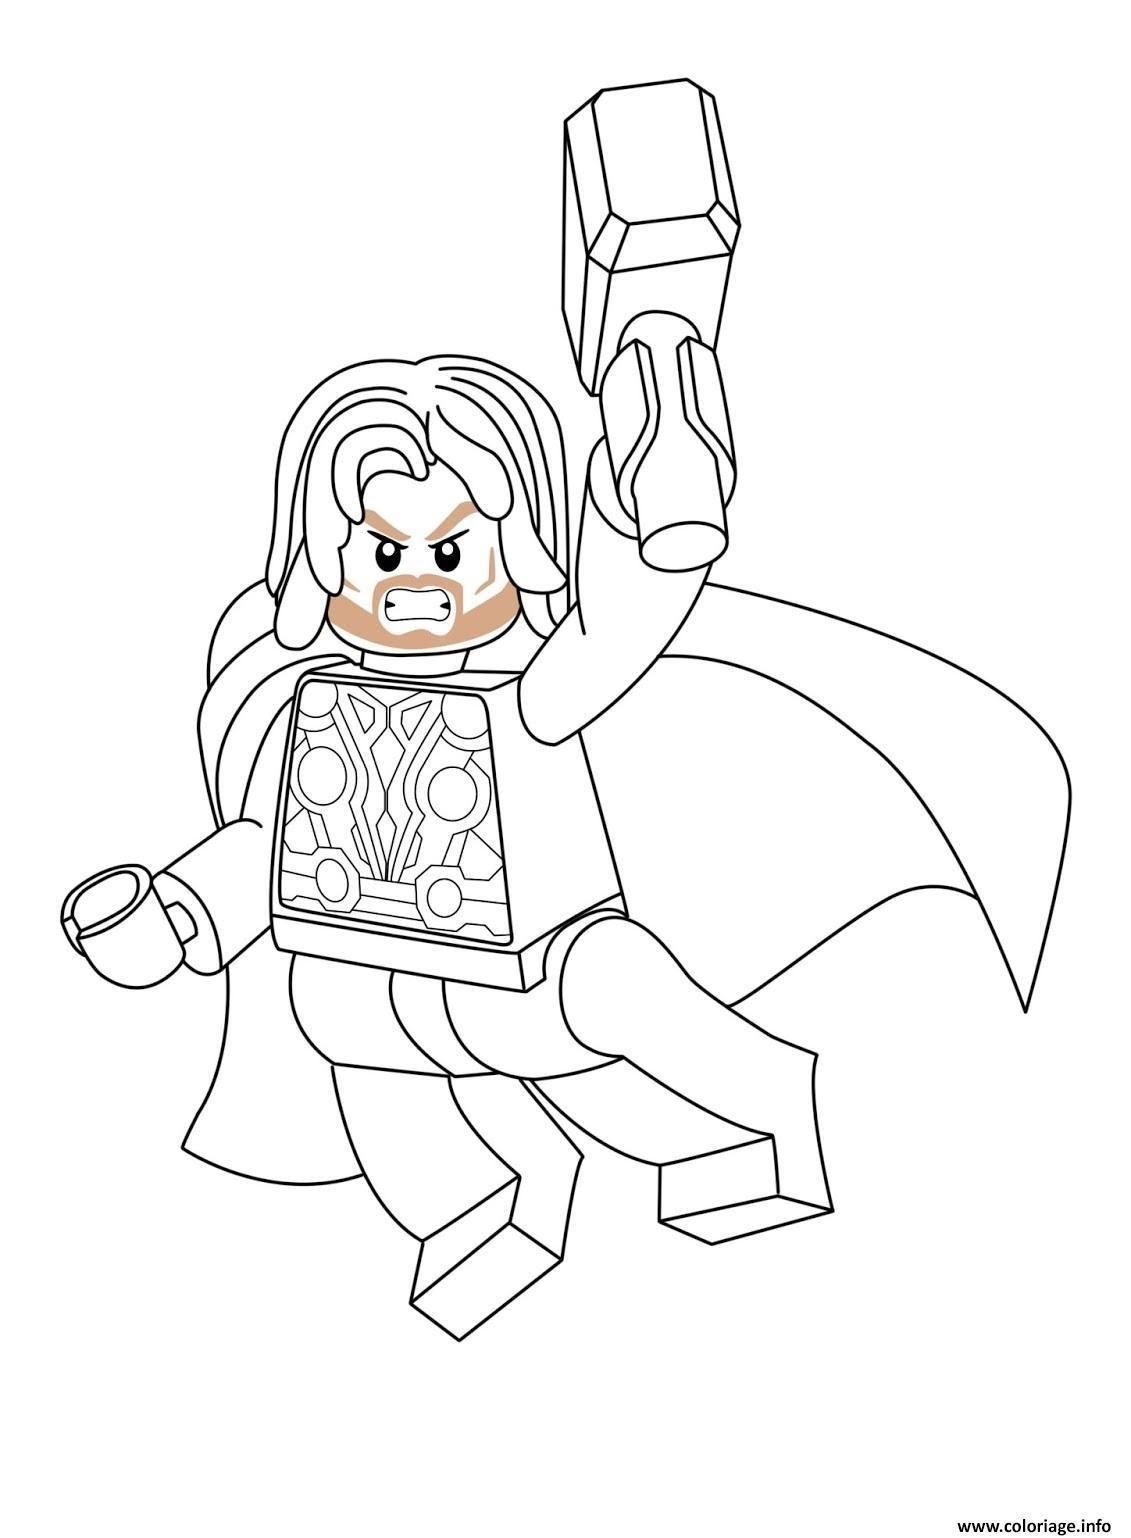 10 Coloriage Imprimer Thor Superhero Coloring Pages Superhero Coloring Lego Coloring Pages